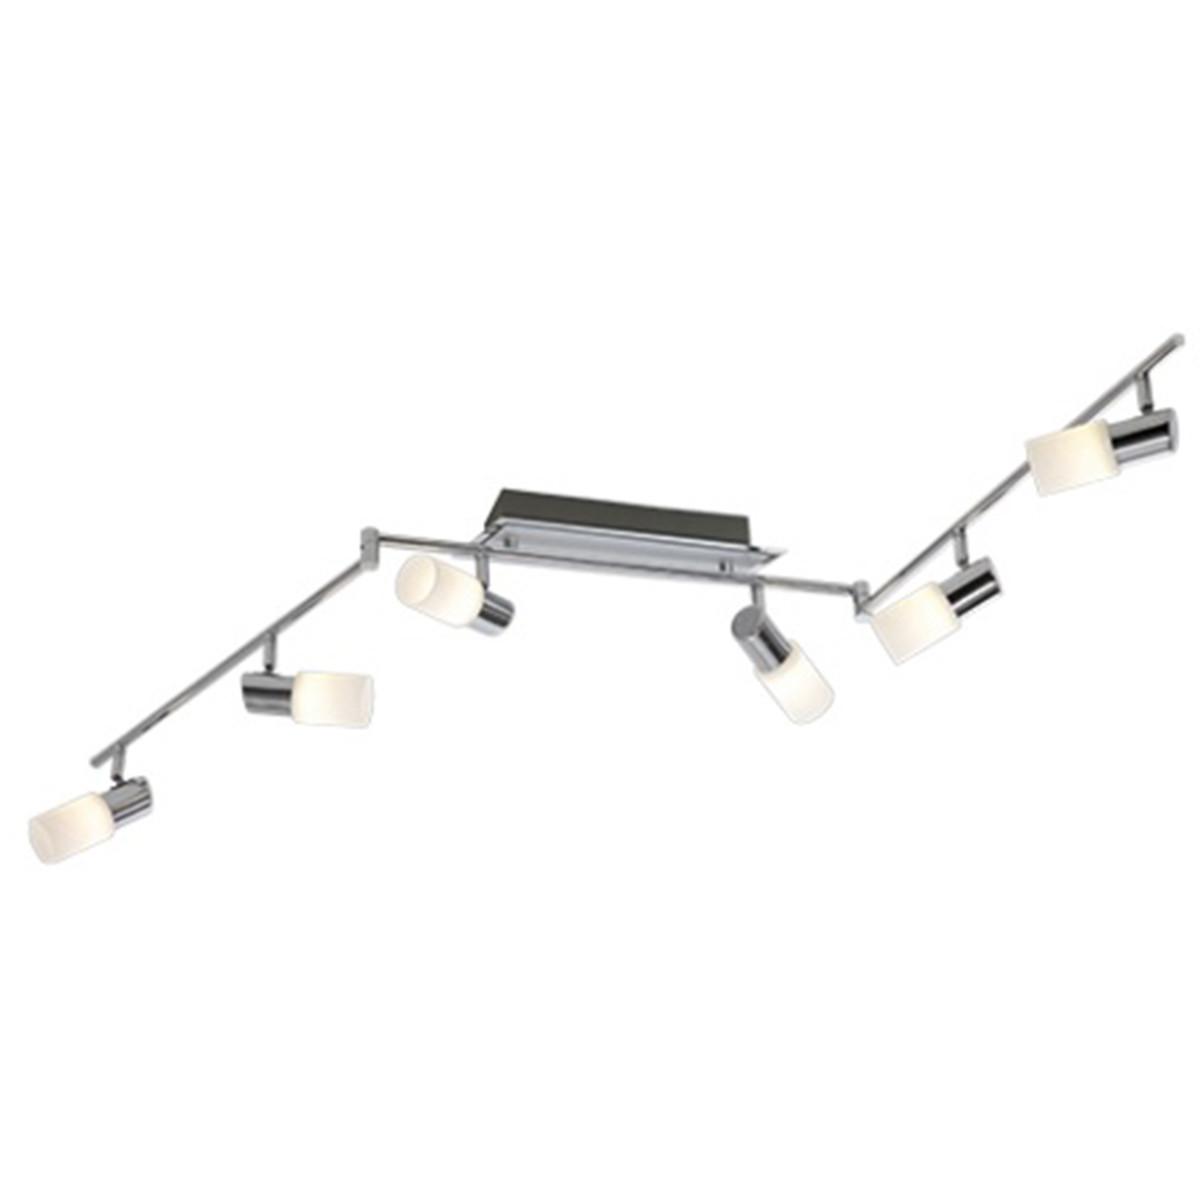 OSRAM - LED Plafondspot - Trion Clupo - 24W - Warm Wit 3000K - 6-lichts - Rechthoek - Mat Chroom - A